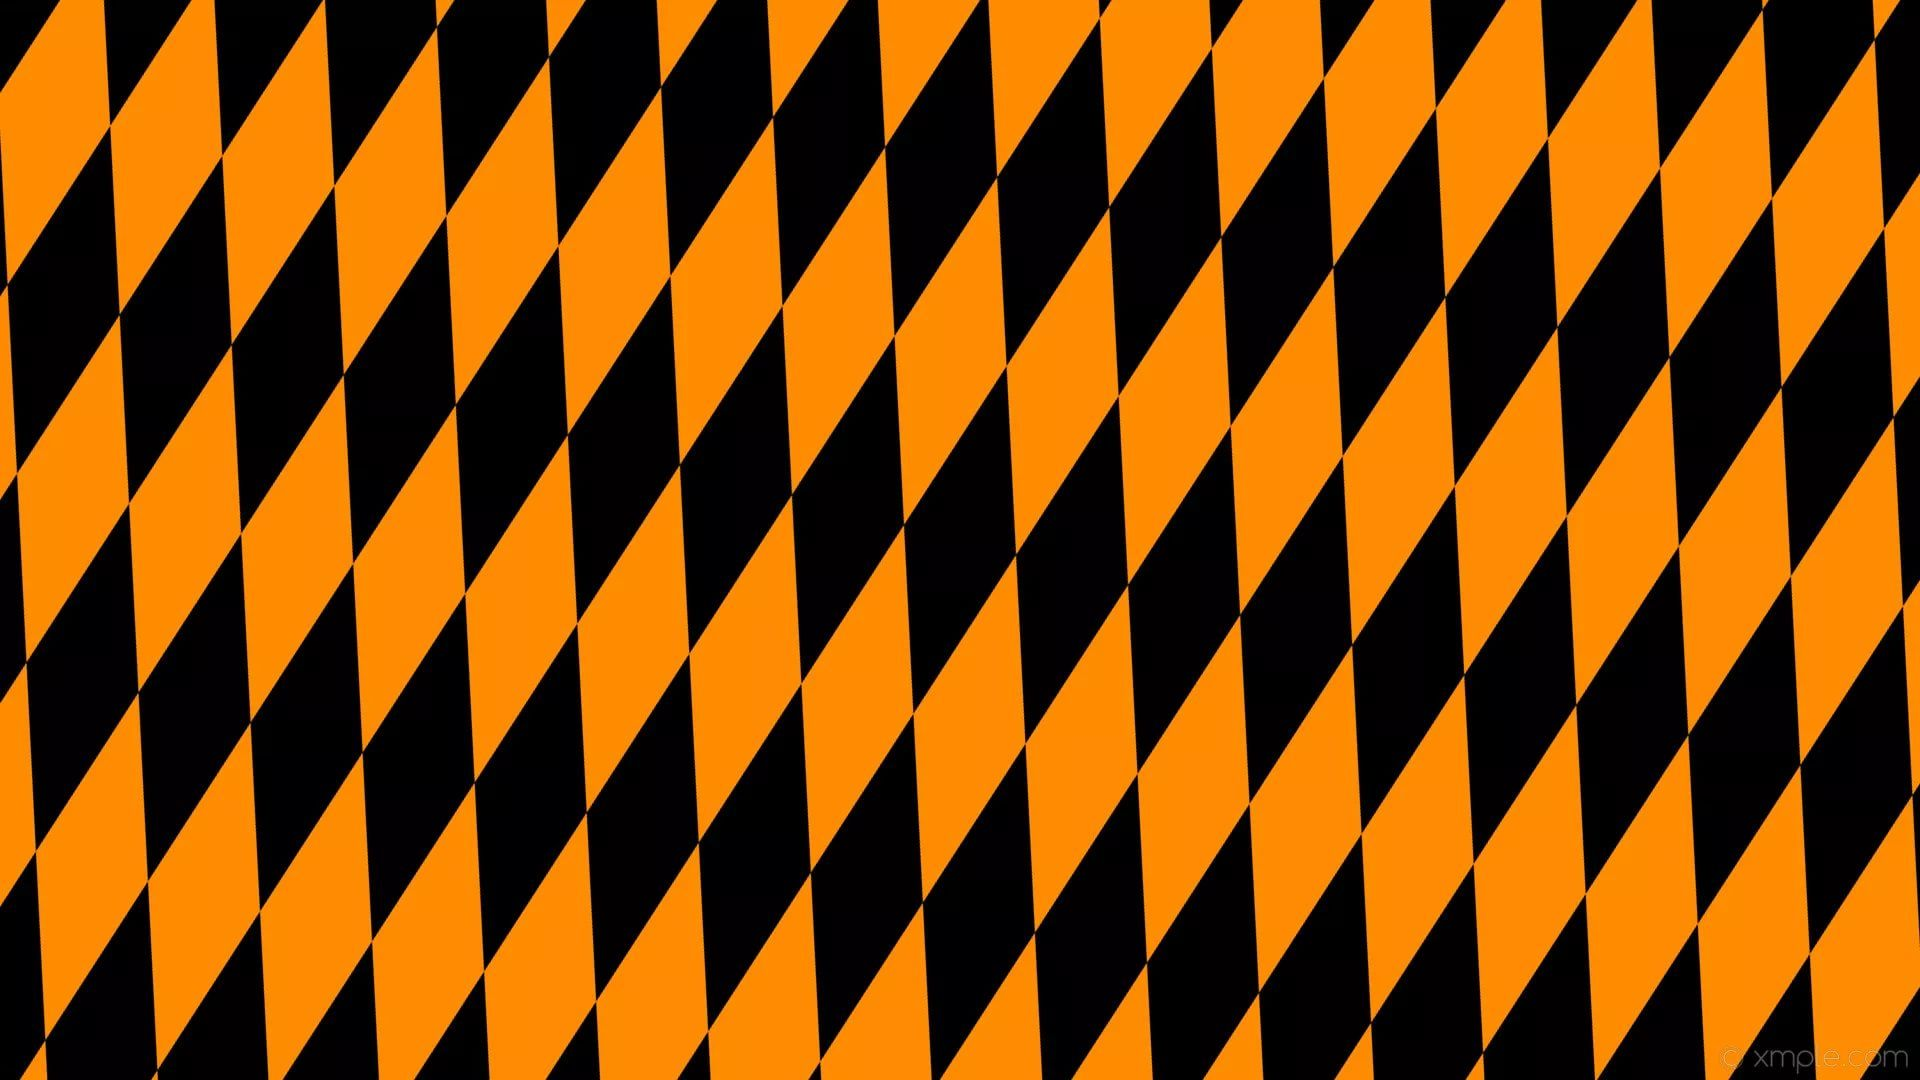 Black And Orange Pic